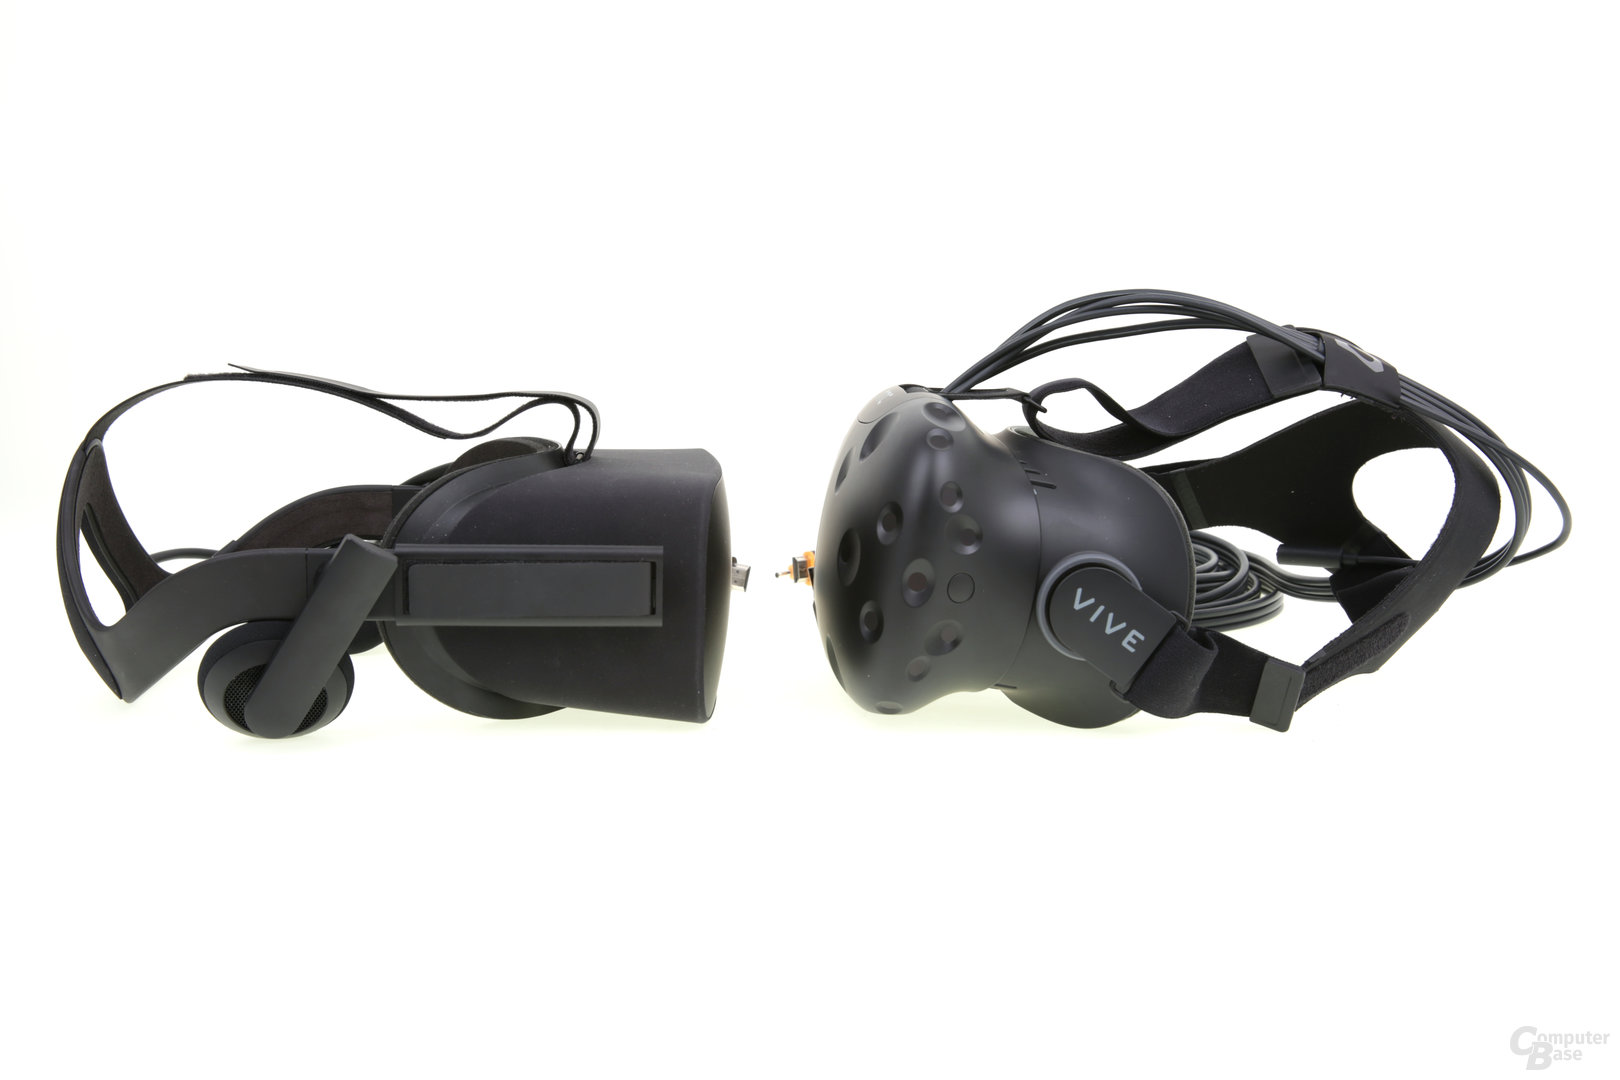 Oculus Rift (CV1) und HTC Vive (final)